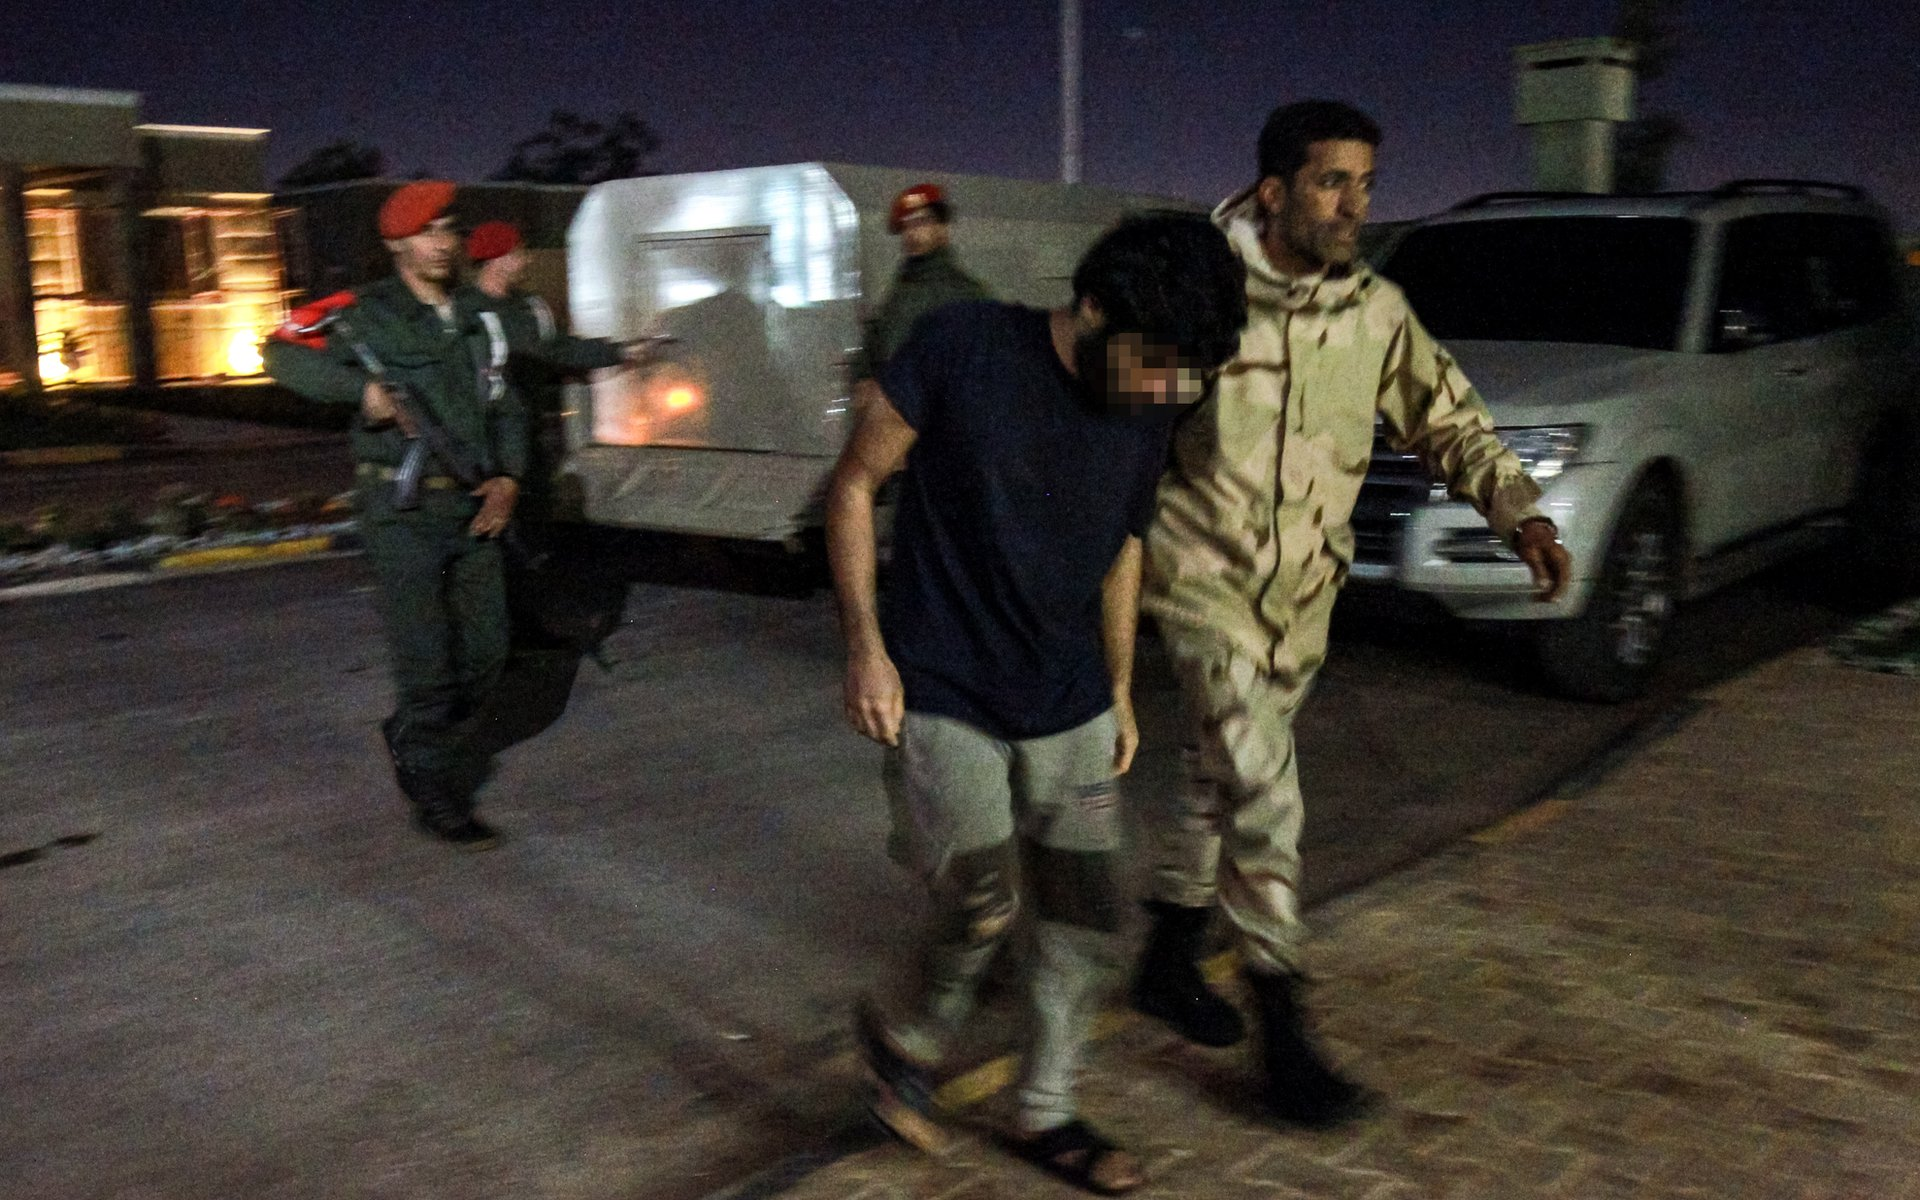 Alleged Syrian mercenary arrested by forces loyal to Libyan general Khalifa Haftar in Benghazi